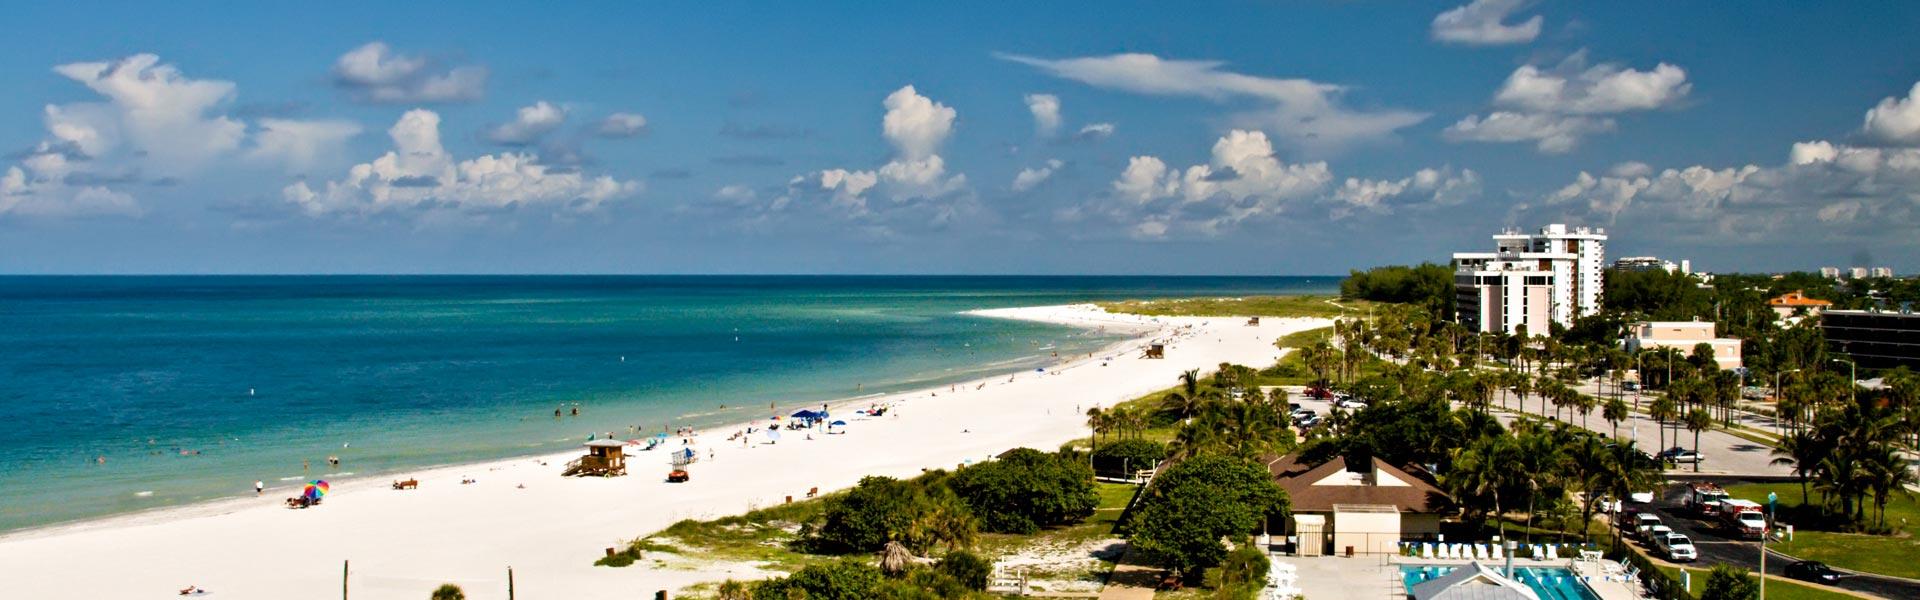 Sarasota-FL-large